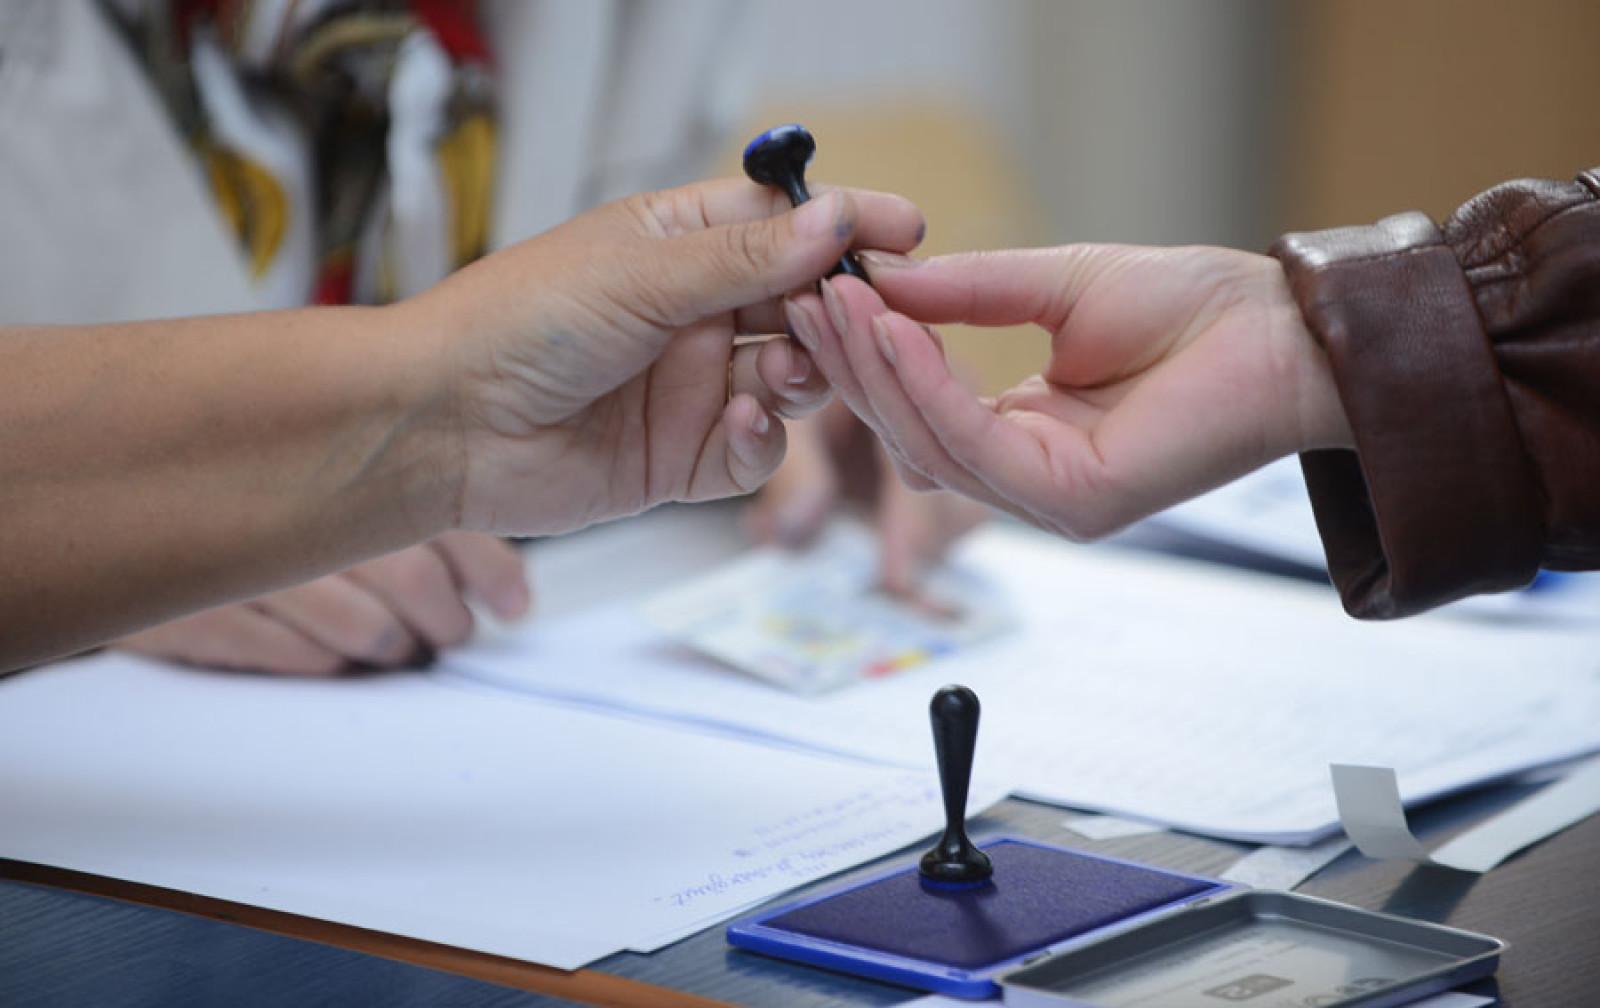 alegeri-vot-votare.73yndxwhpk